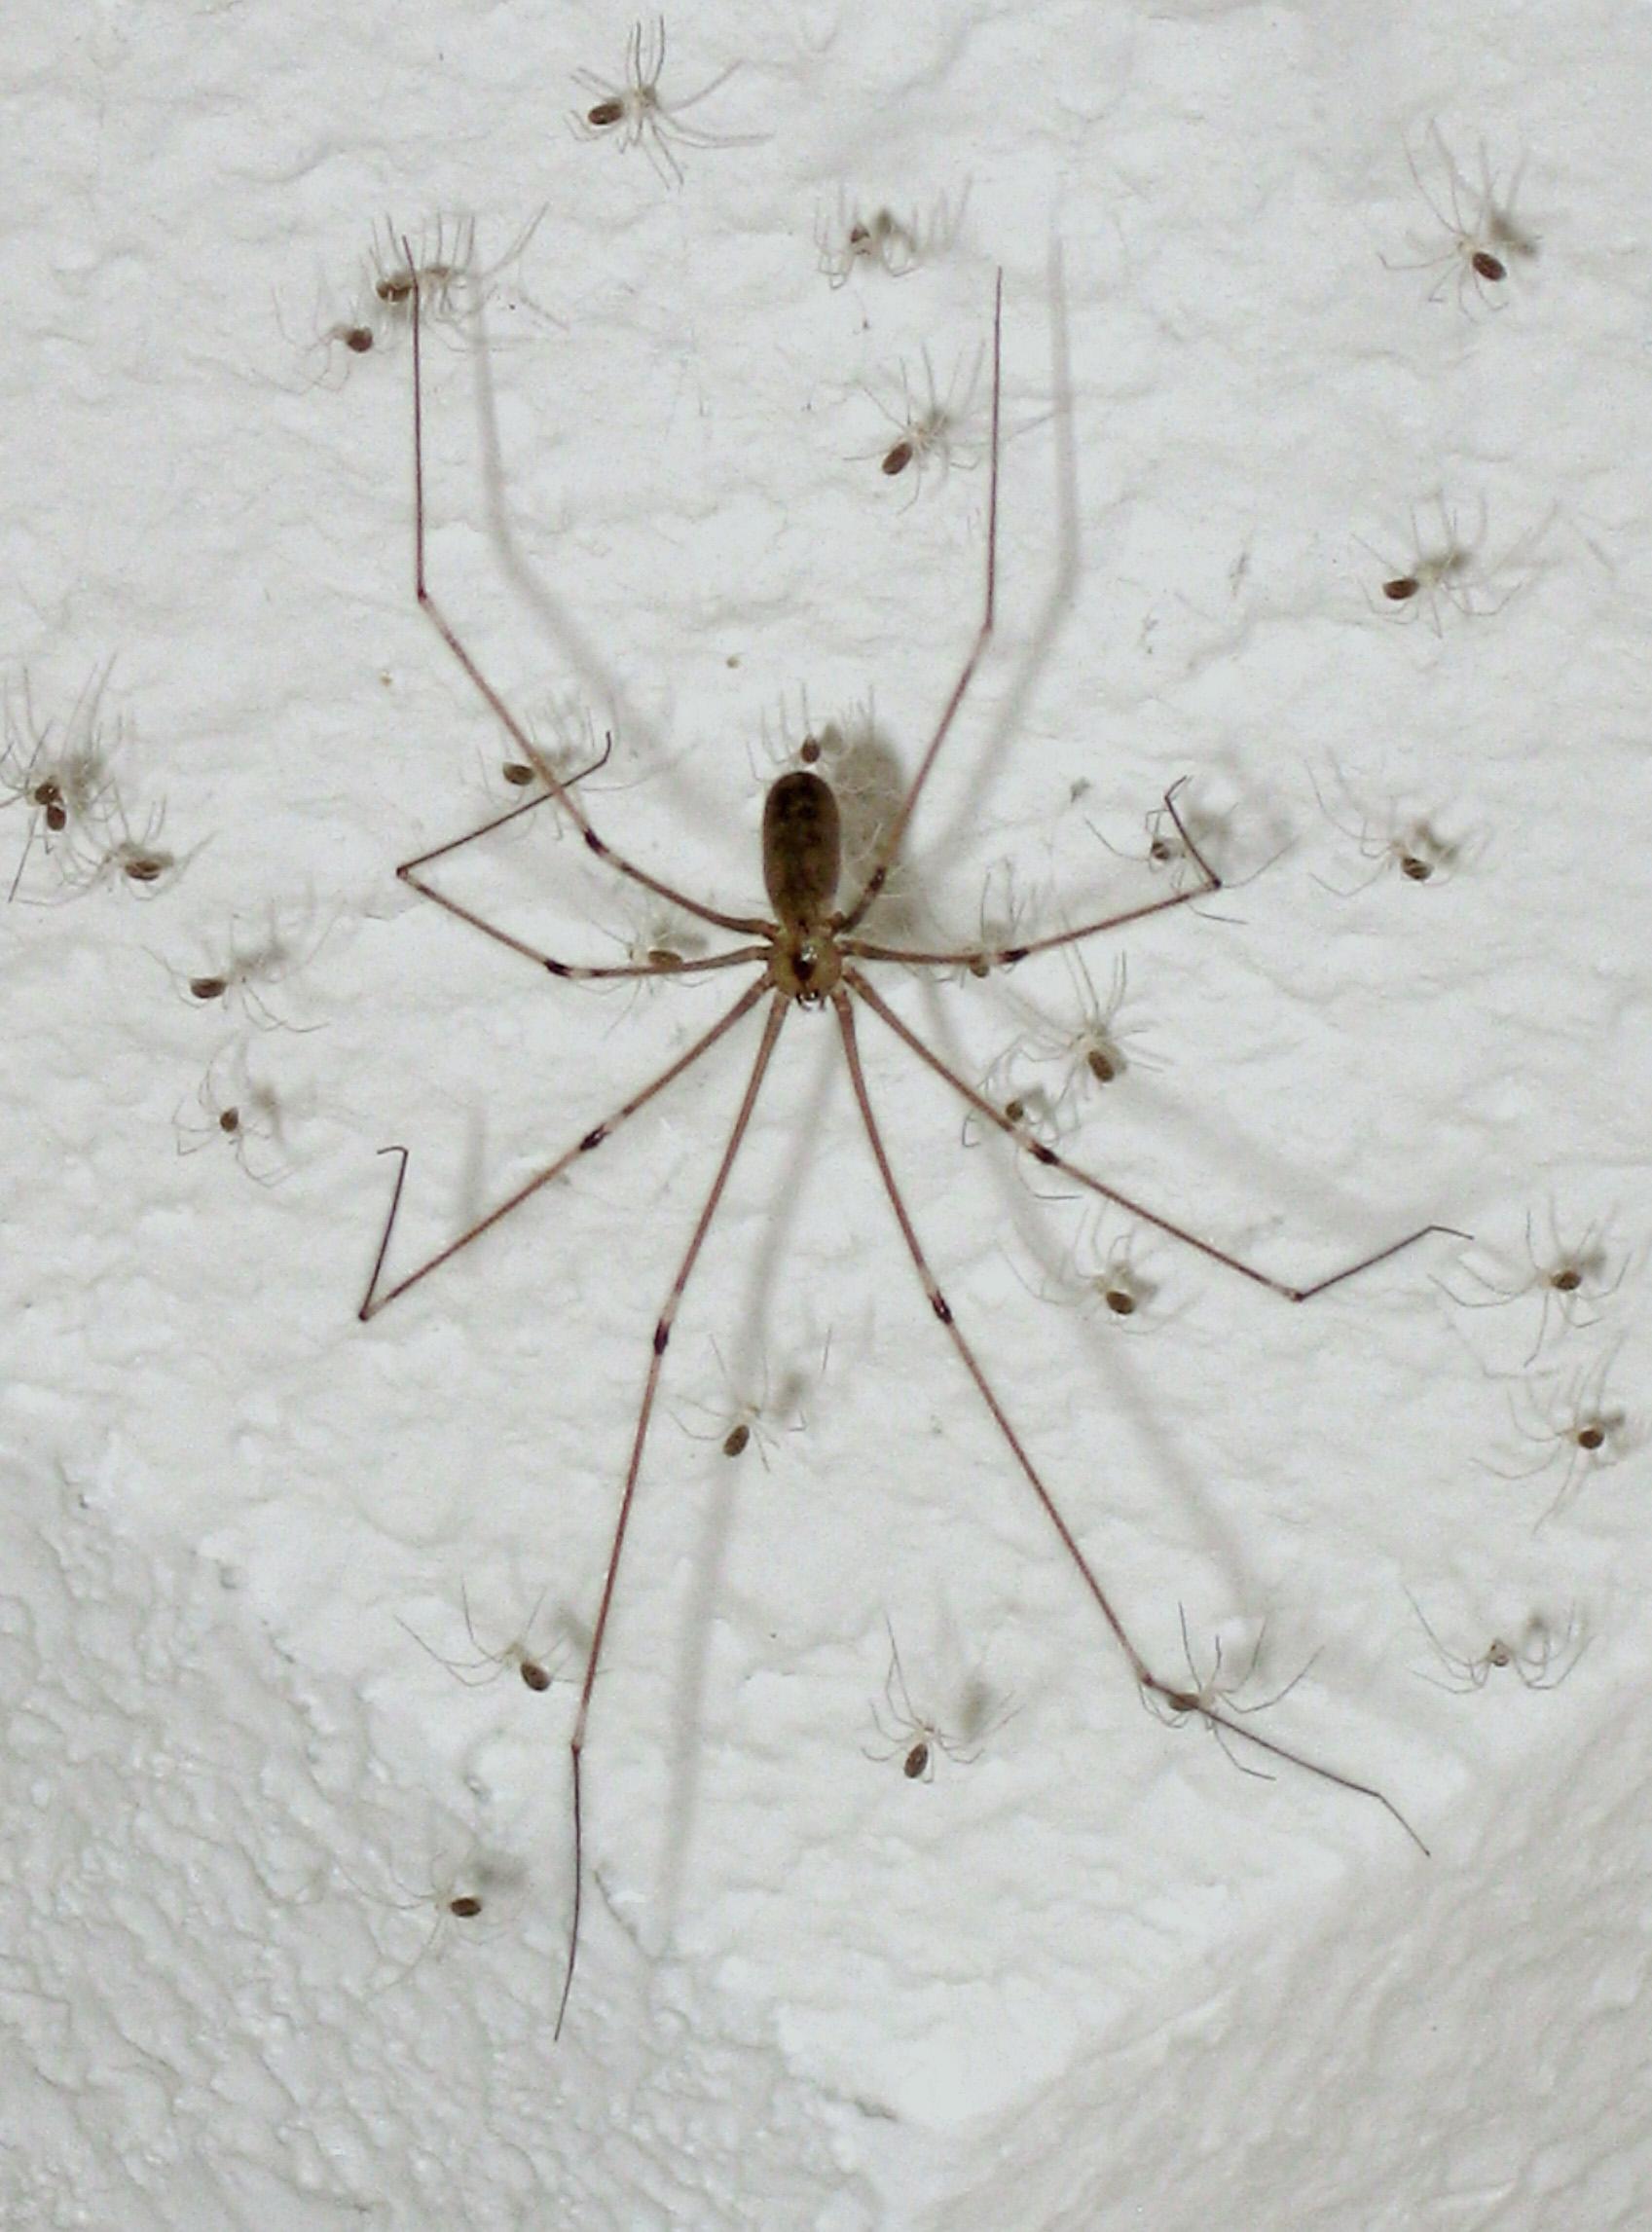 Pholcus Phalangioides Insecte Benefice Sau O Problema